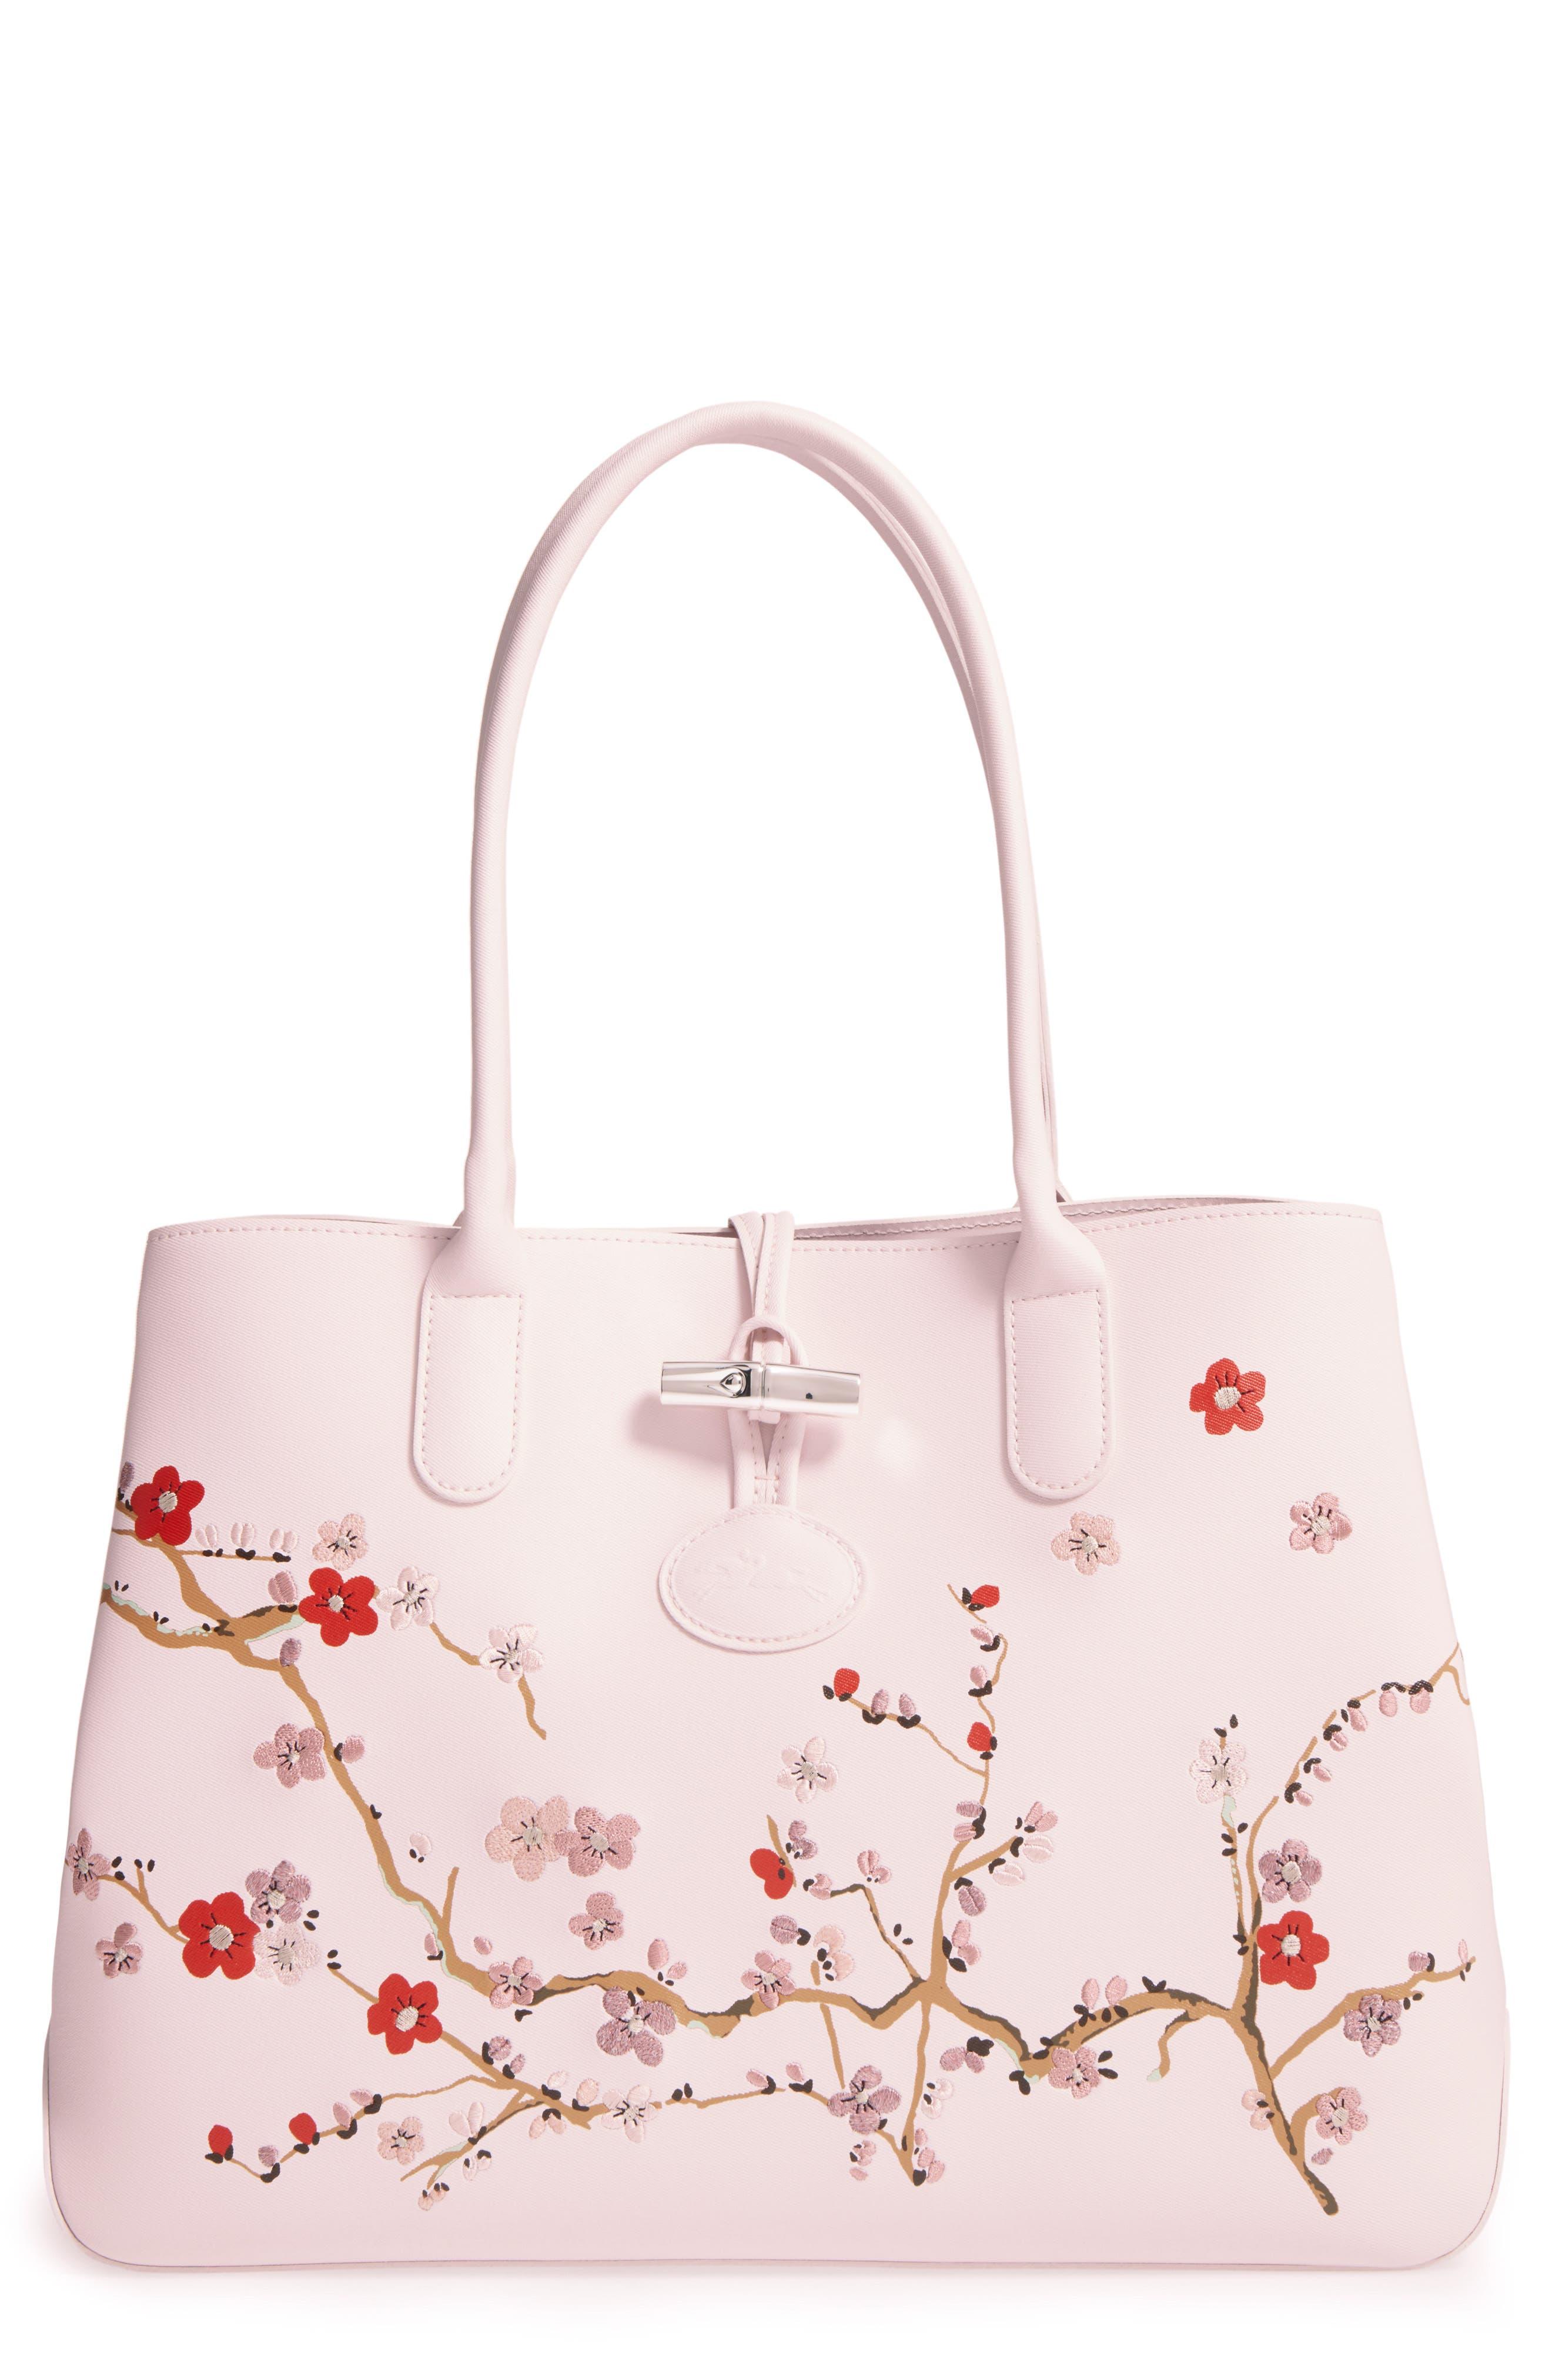 Main Image - Longchamp Roseau Sakura Embroidered Leather Shoulder Tote